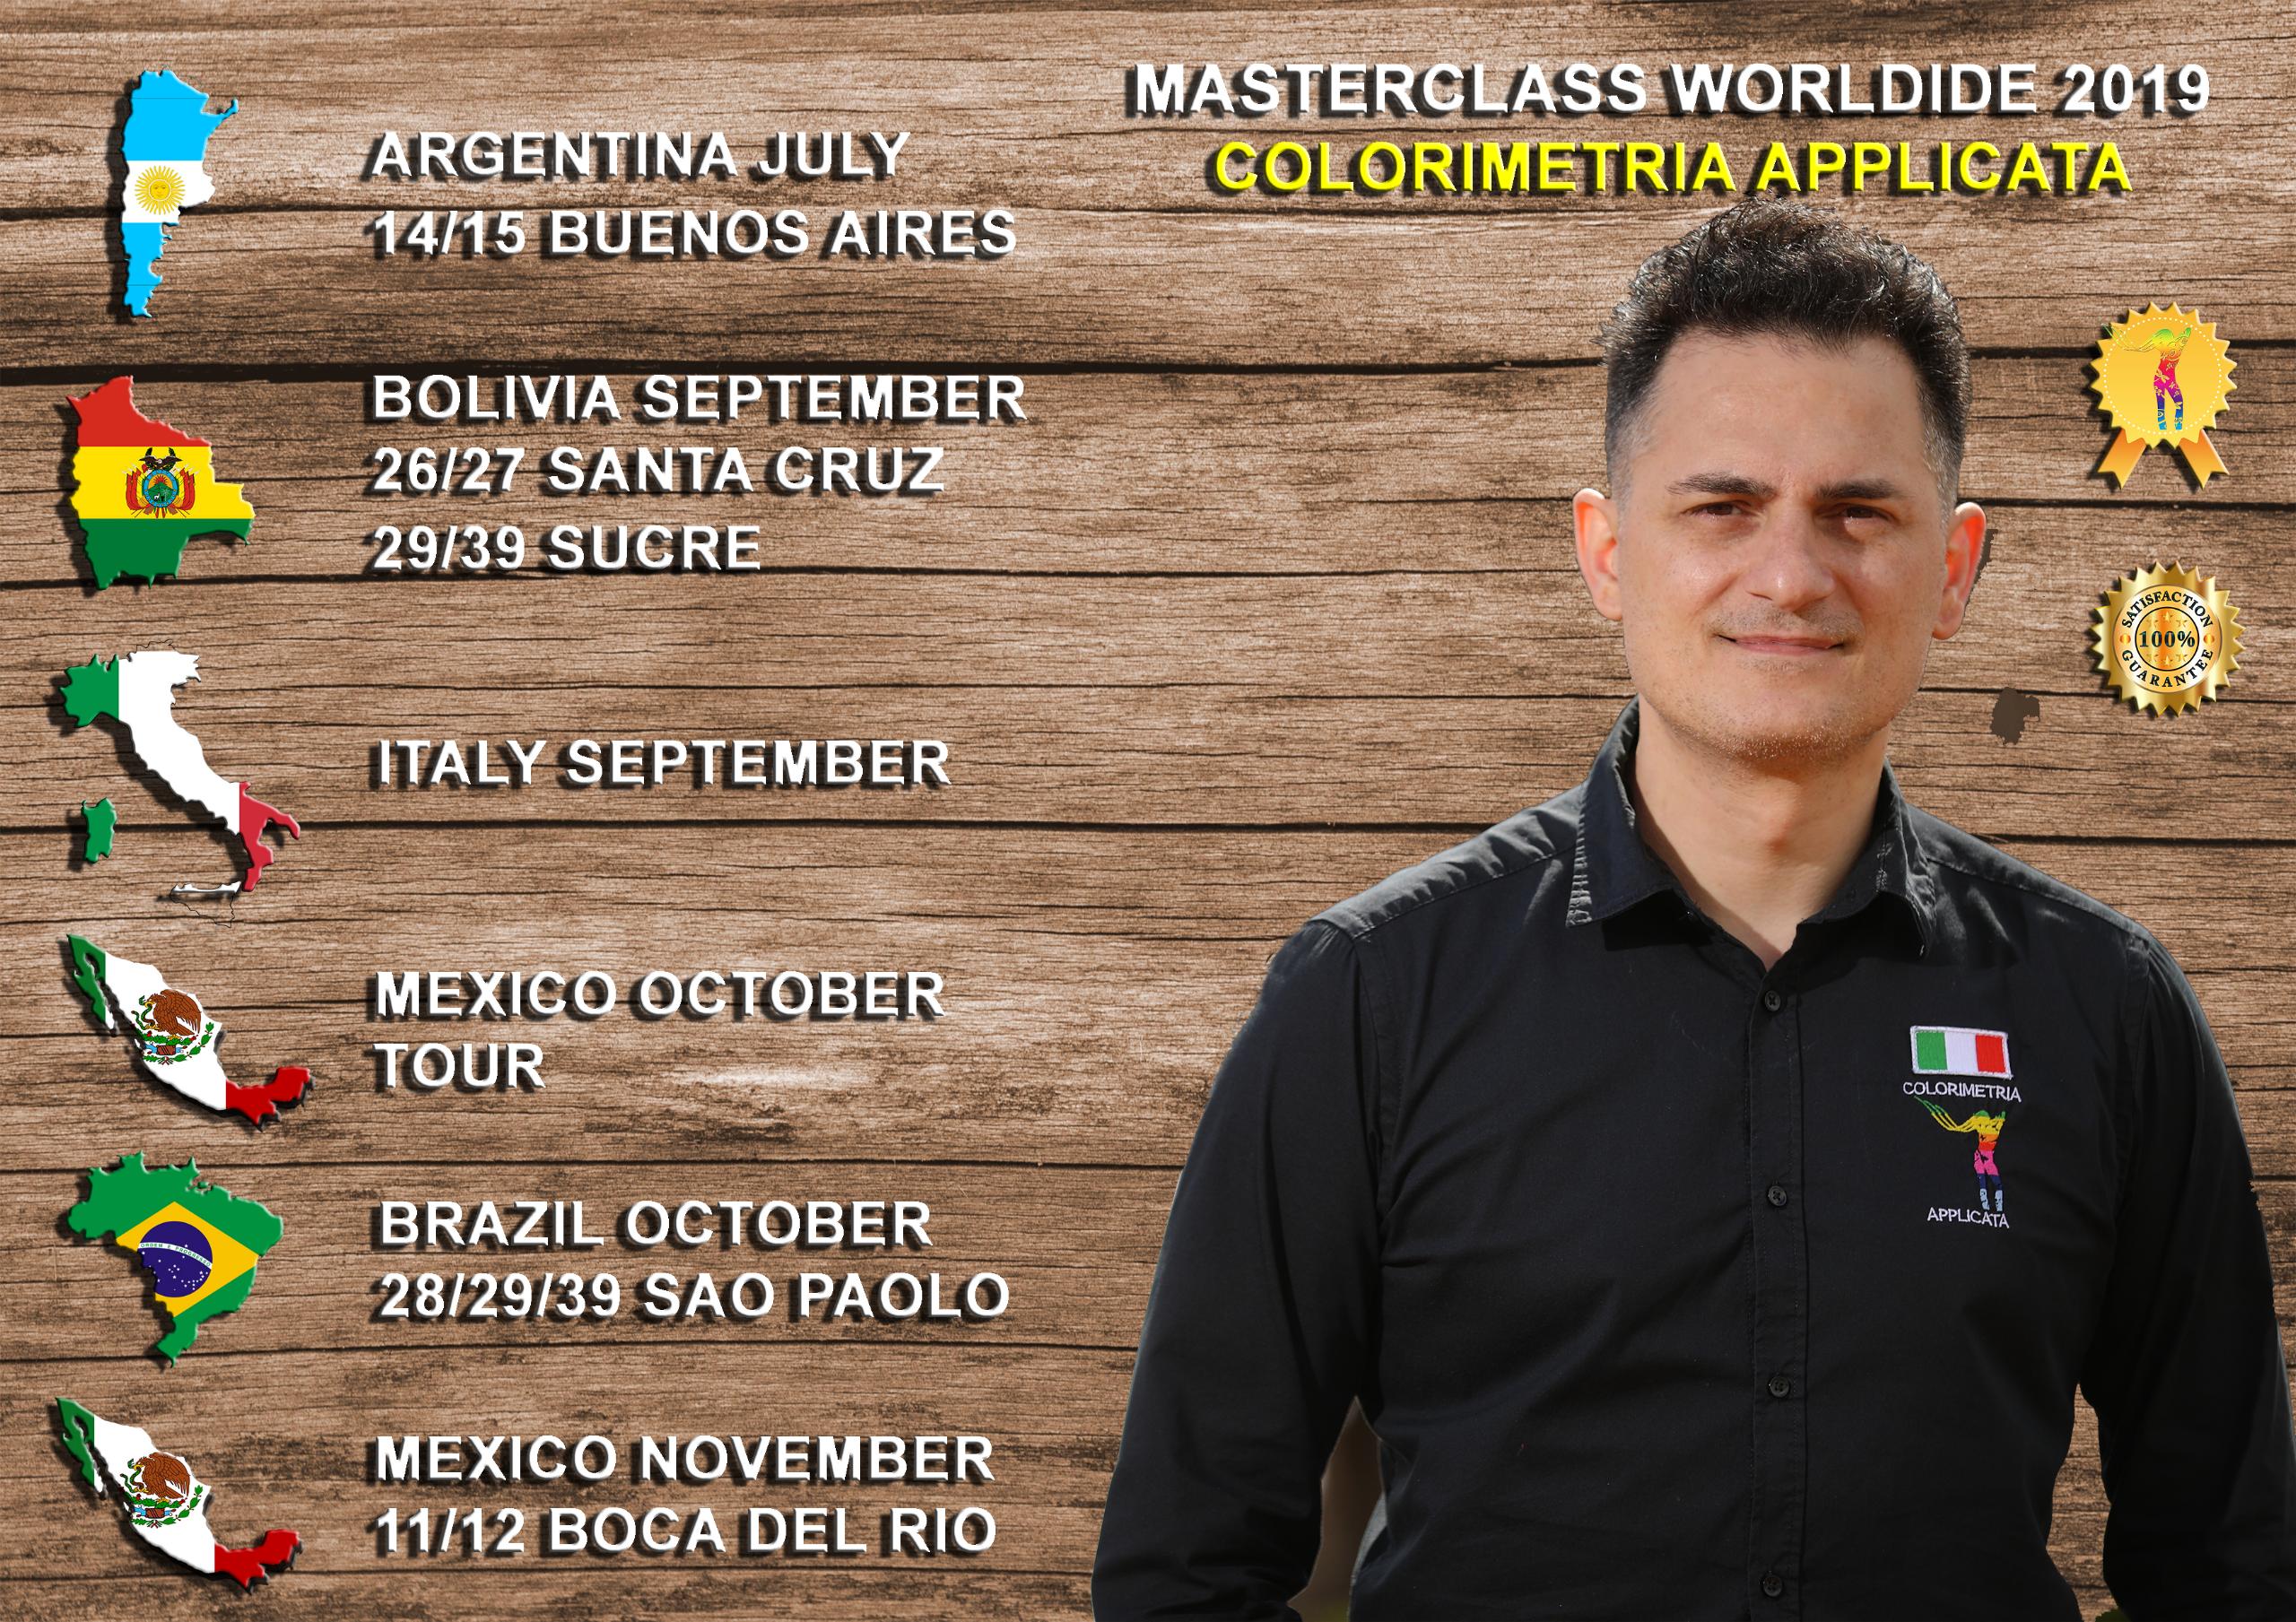 MASTERCLASS WORLDWIDE BY CLAUDIO TERRIBILE HAIRCOLORIST 2019